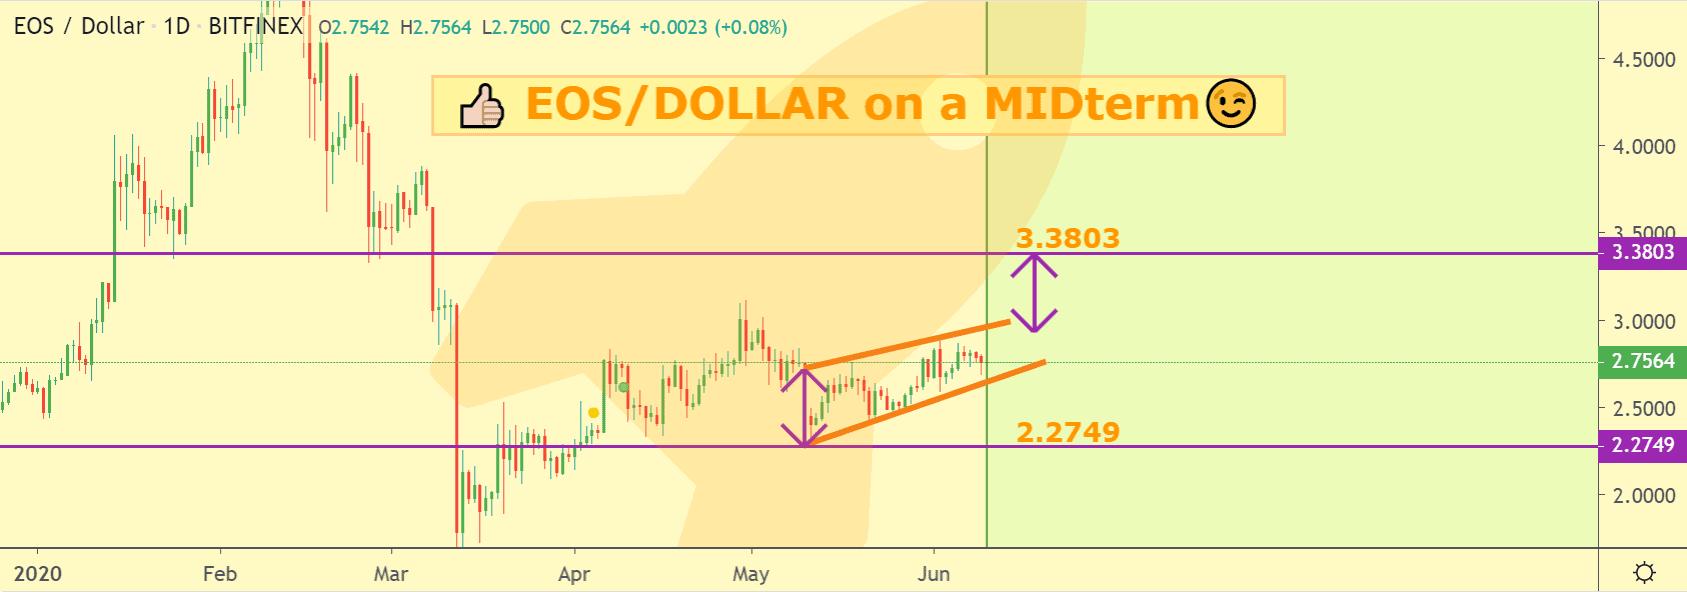 EOS price chart 2 - Jun9